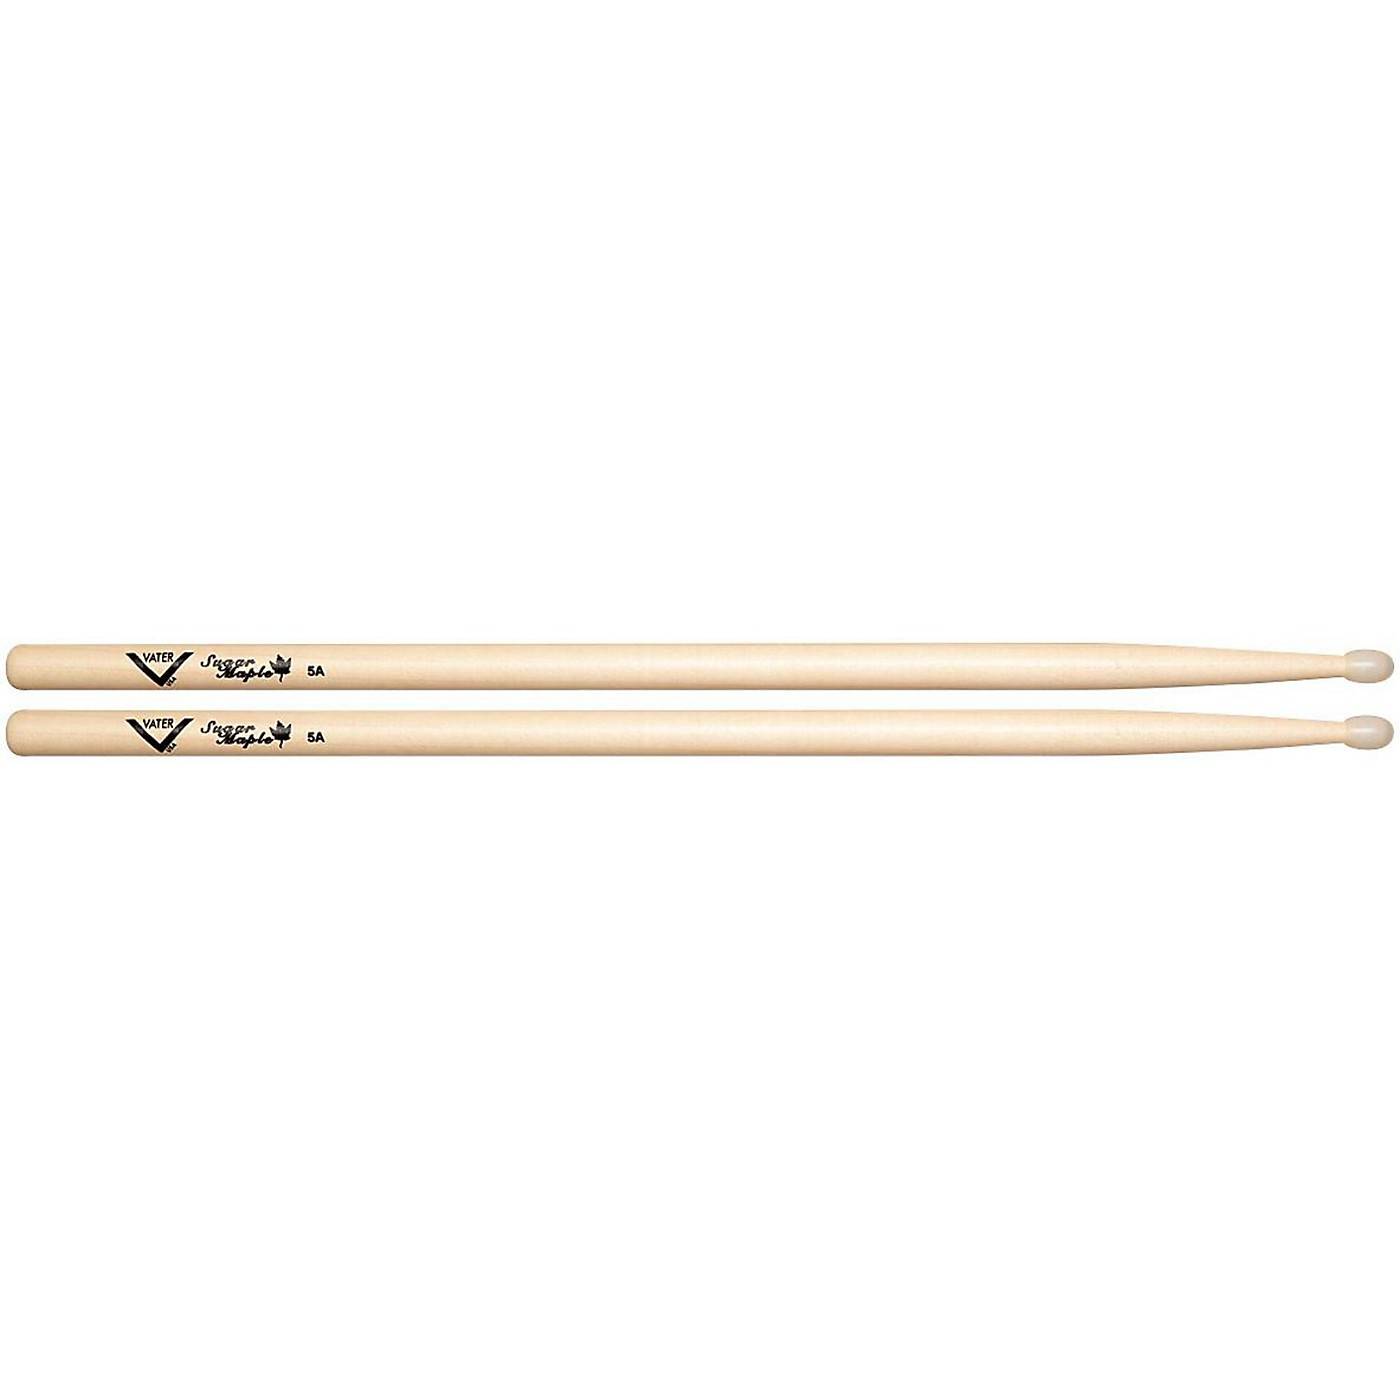 Vater Sugar Maple Drum Stick 5A thumbnail